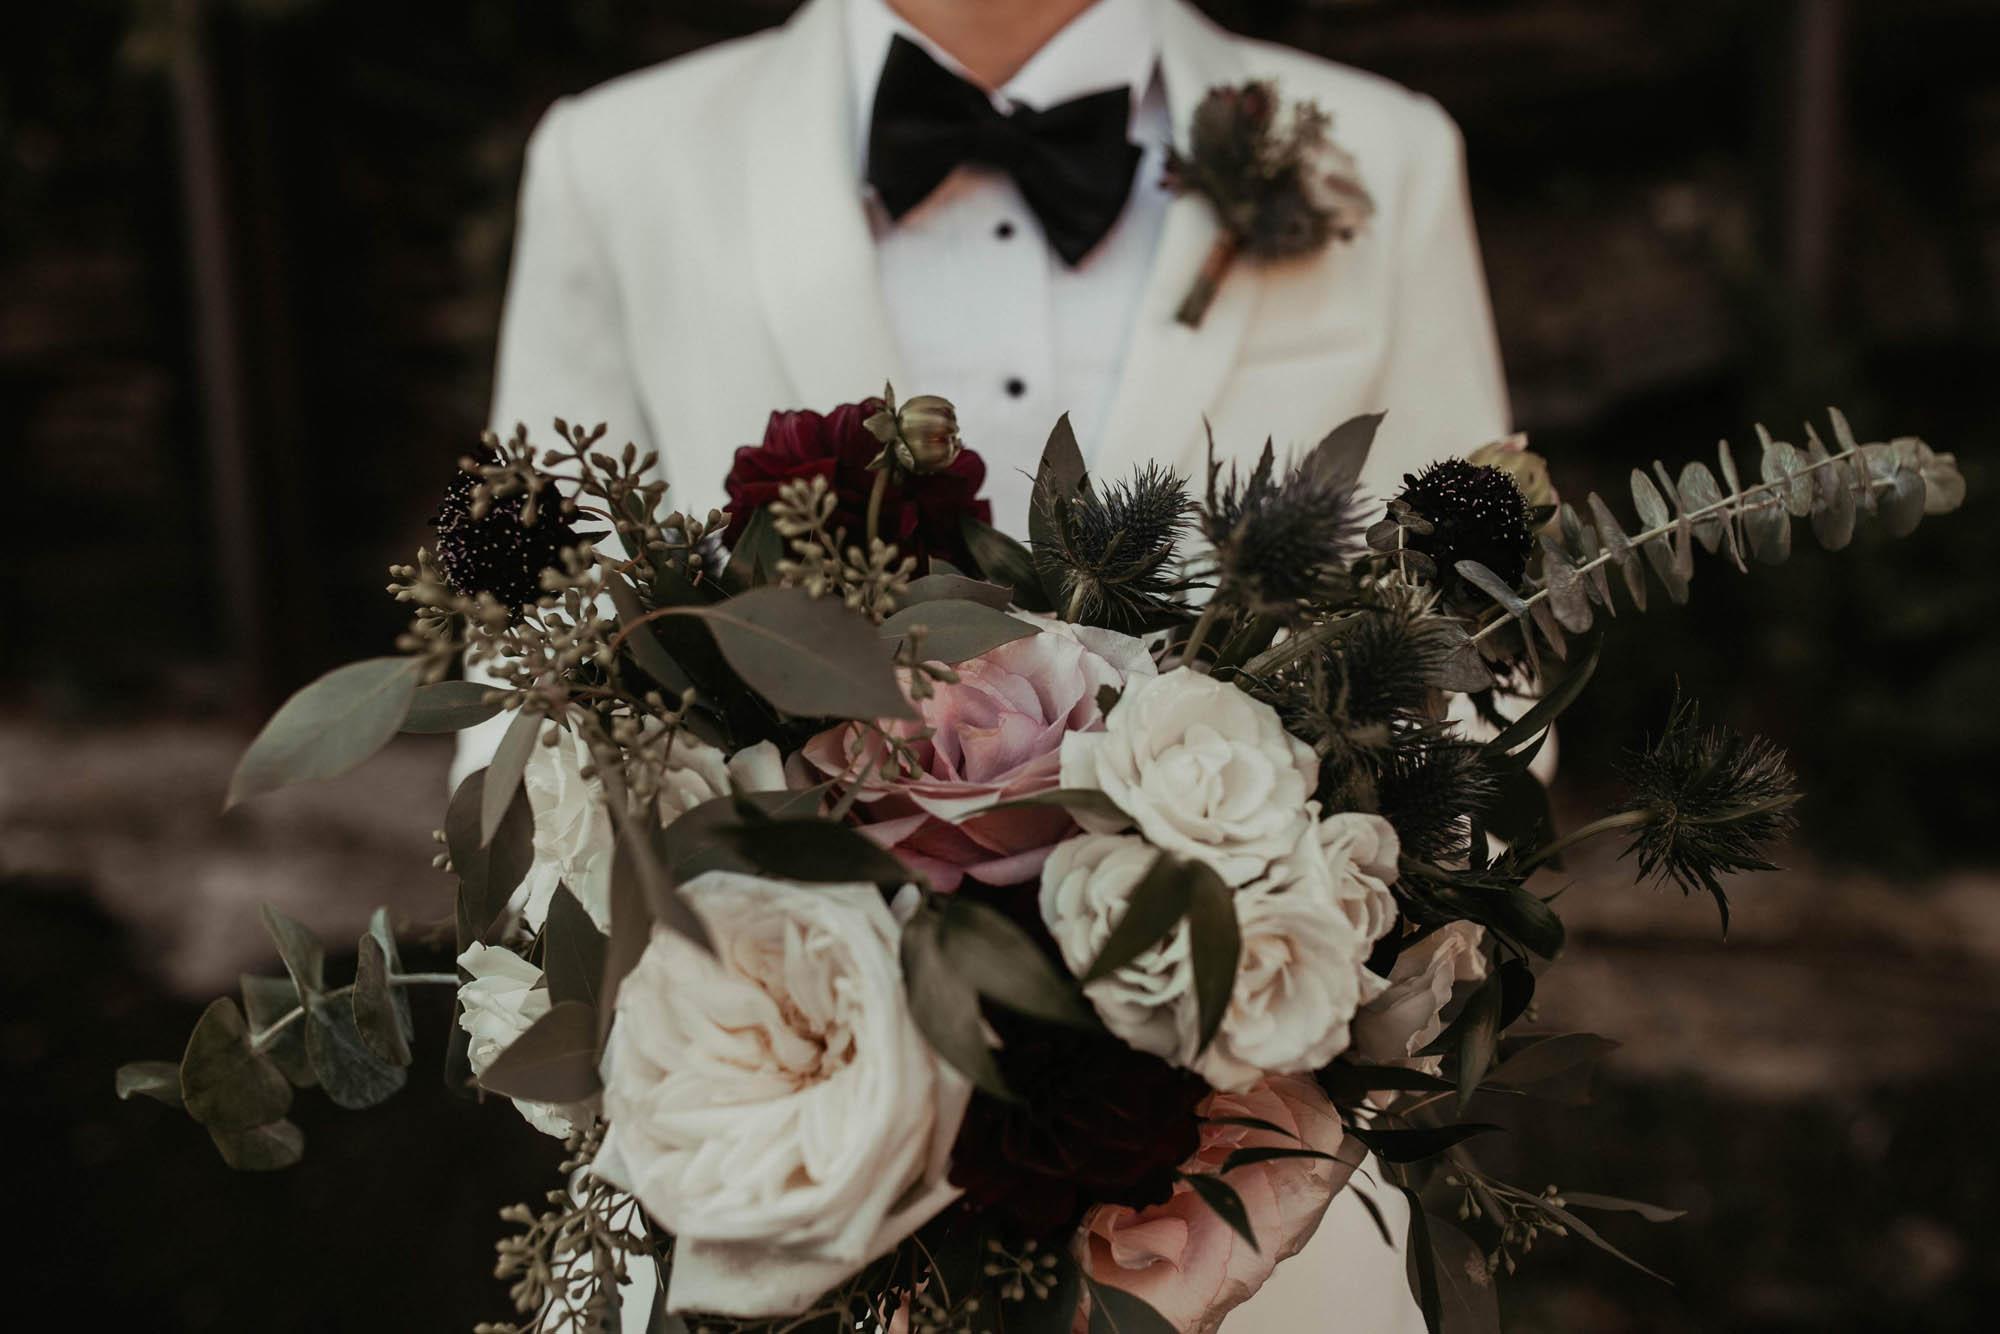 Vintage Inspired Modern Wedding - Chicago - Same-Sex Wedding Inspiration (1)